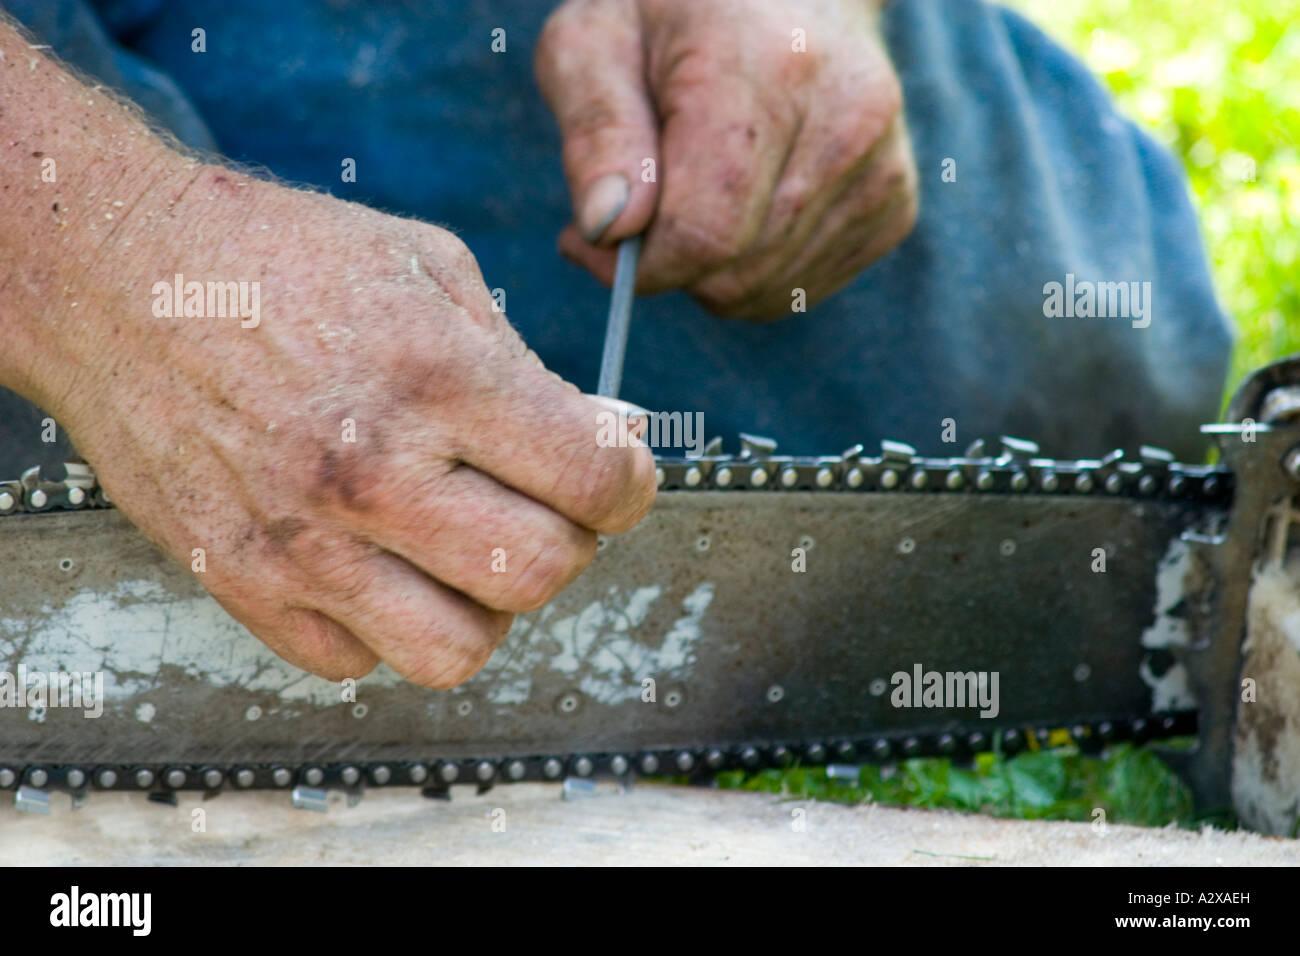 Sharpening Saw Stock Photos & Sharpening Saw Stock Images